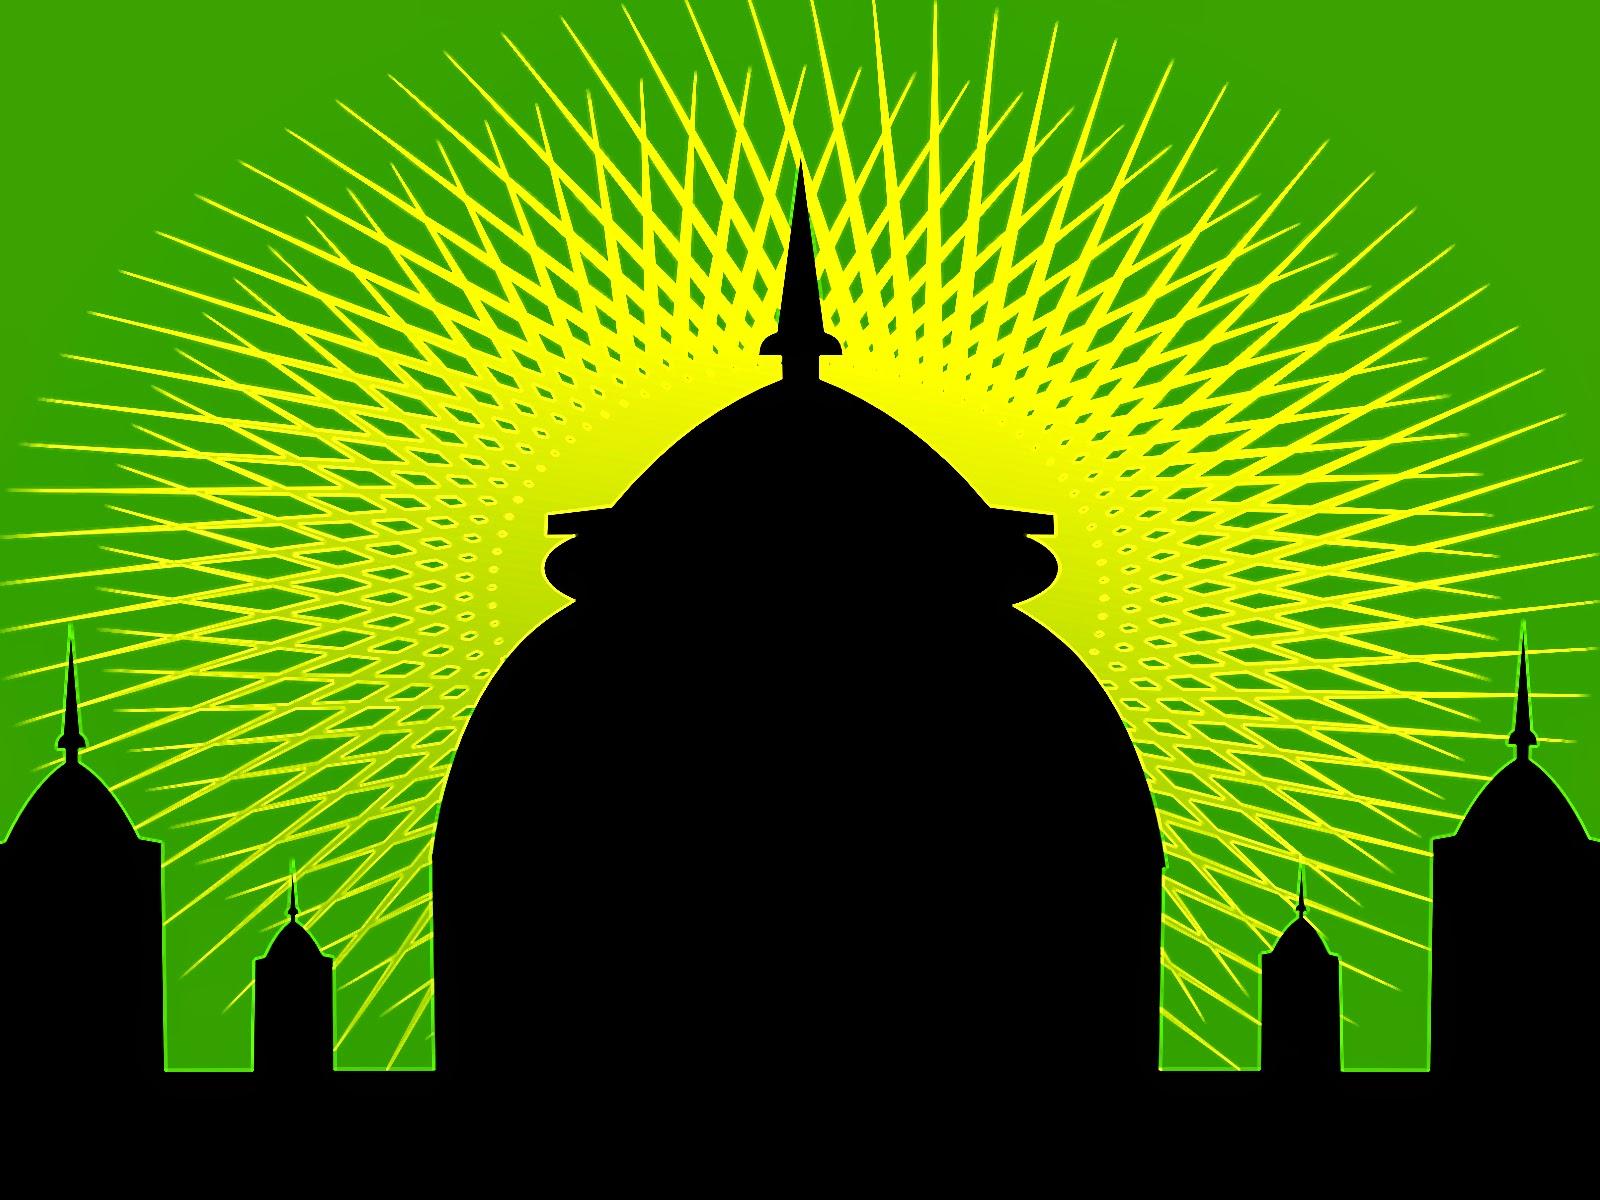 Jadwal Habib Syech Lengkap Sampai Akhir Bulan Mei 2014